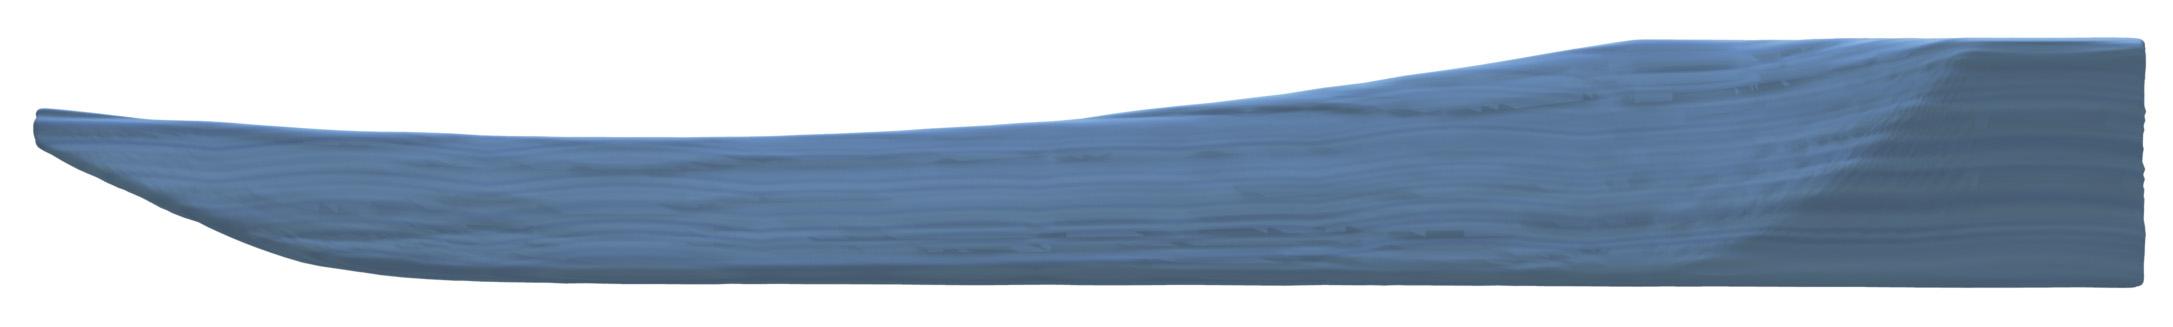 Softwedge Interproximal Wedges Garrison Dental